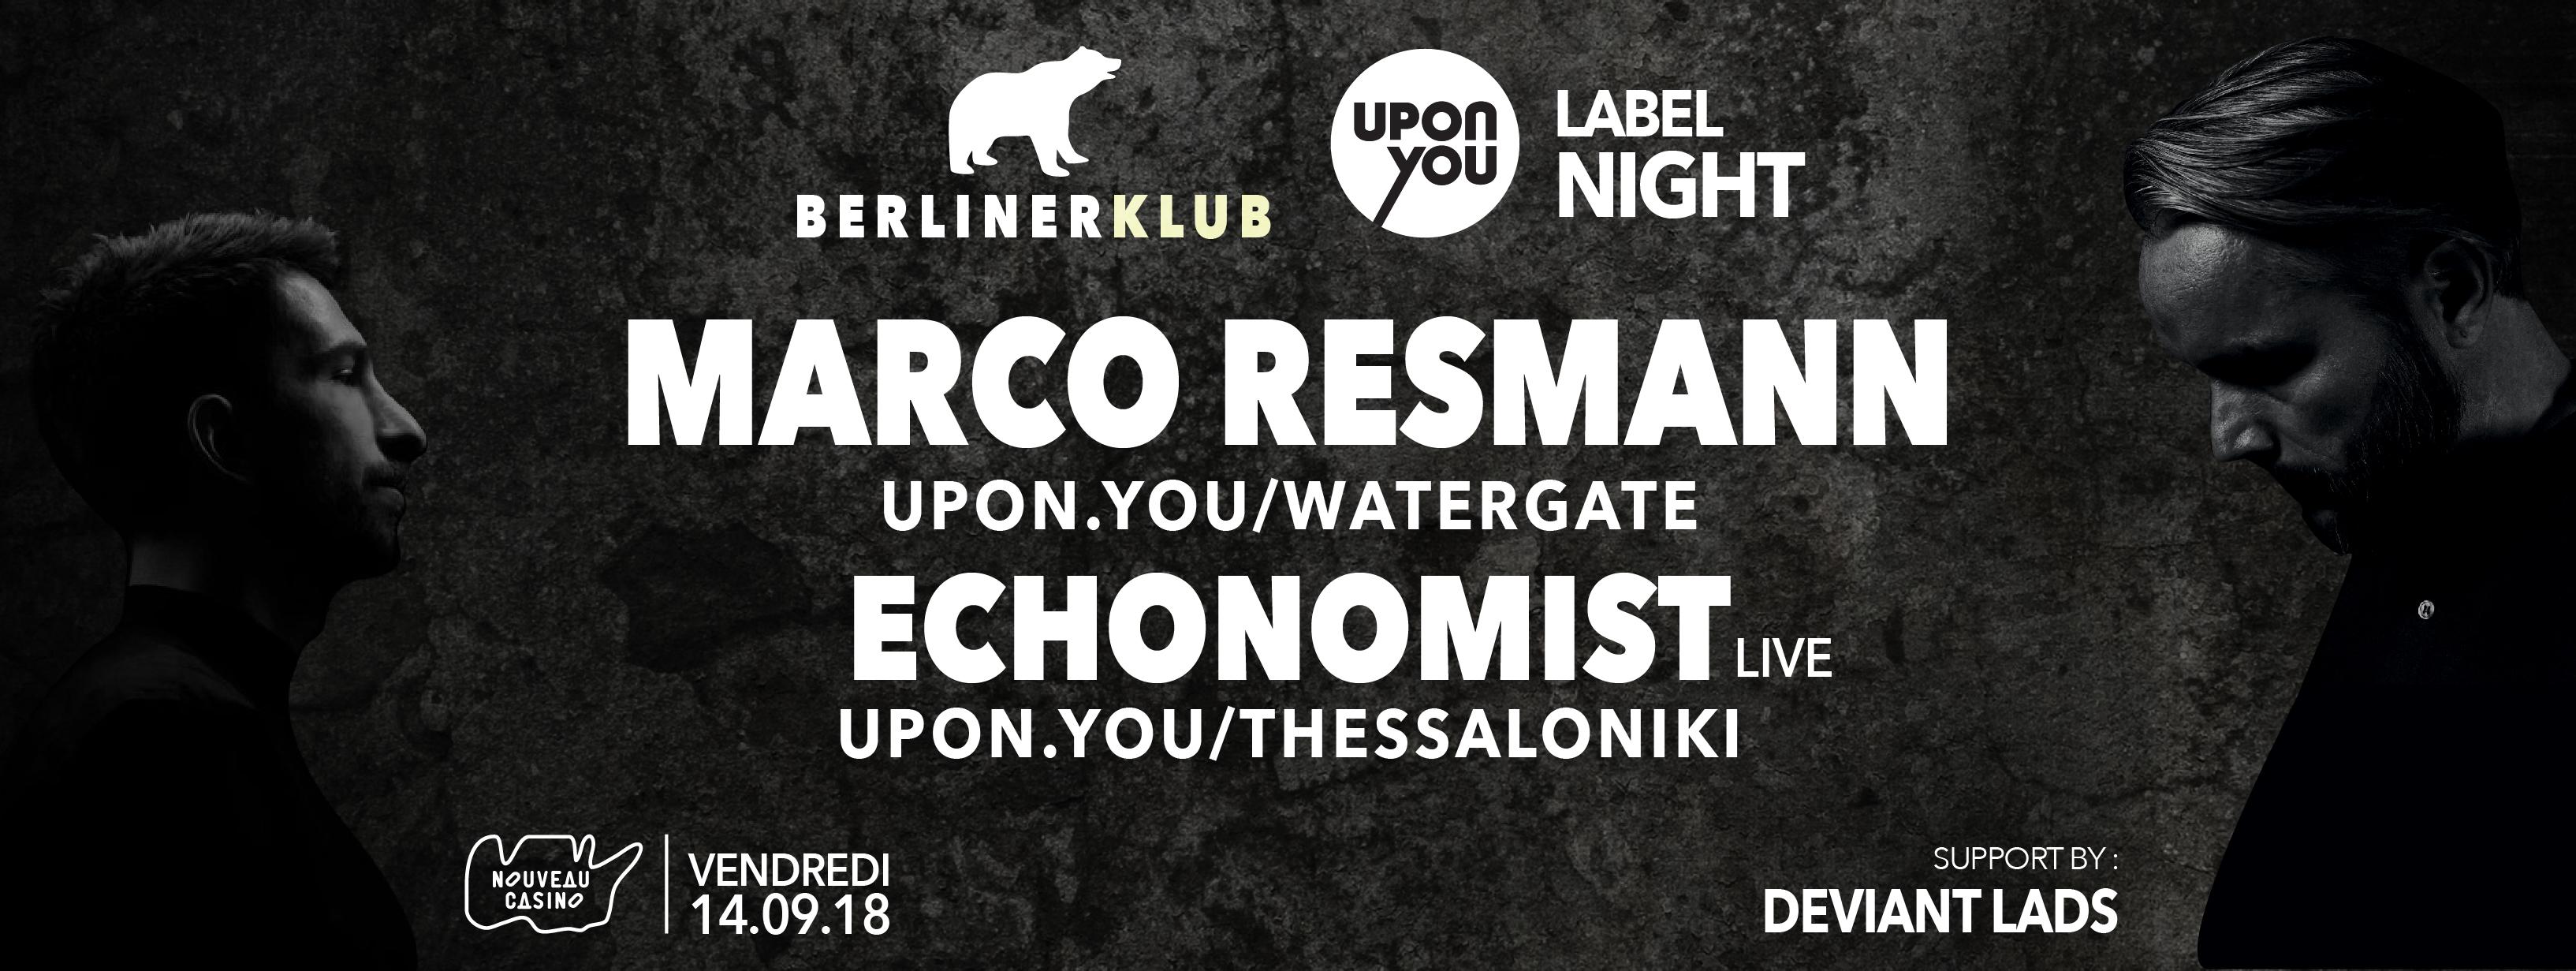 Berliner KLUB : Upon.You label night x Marco Resmann, Echonomist